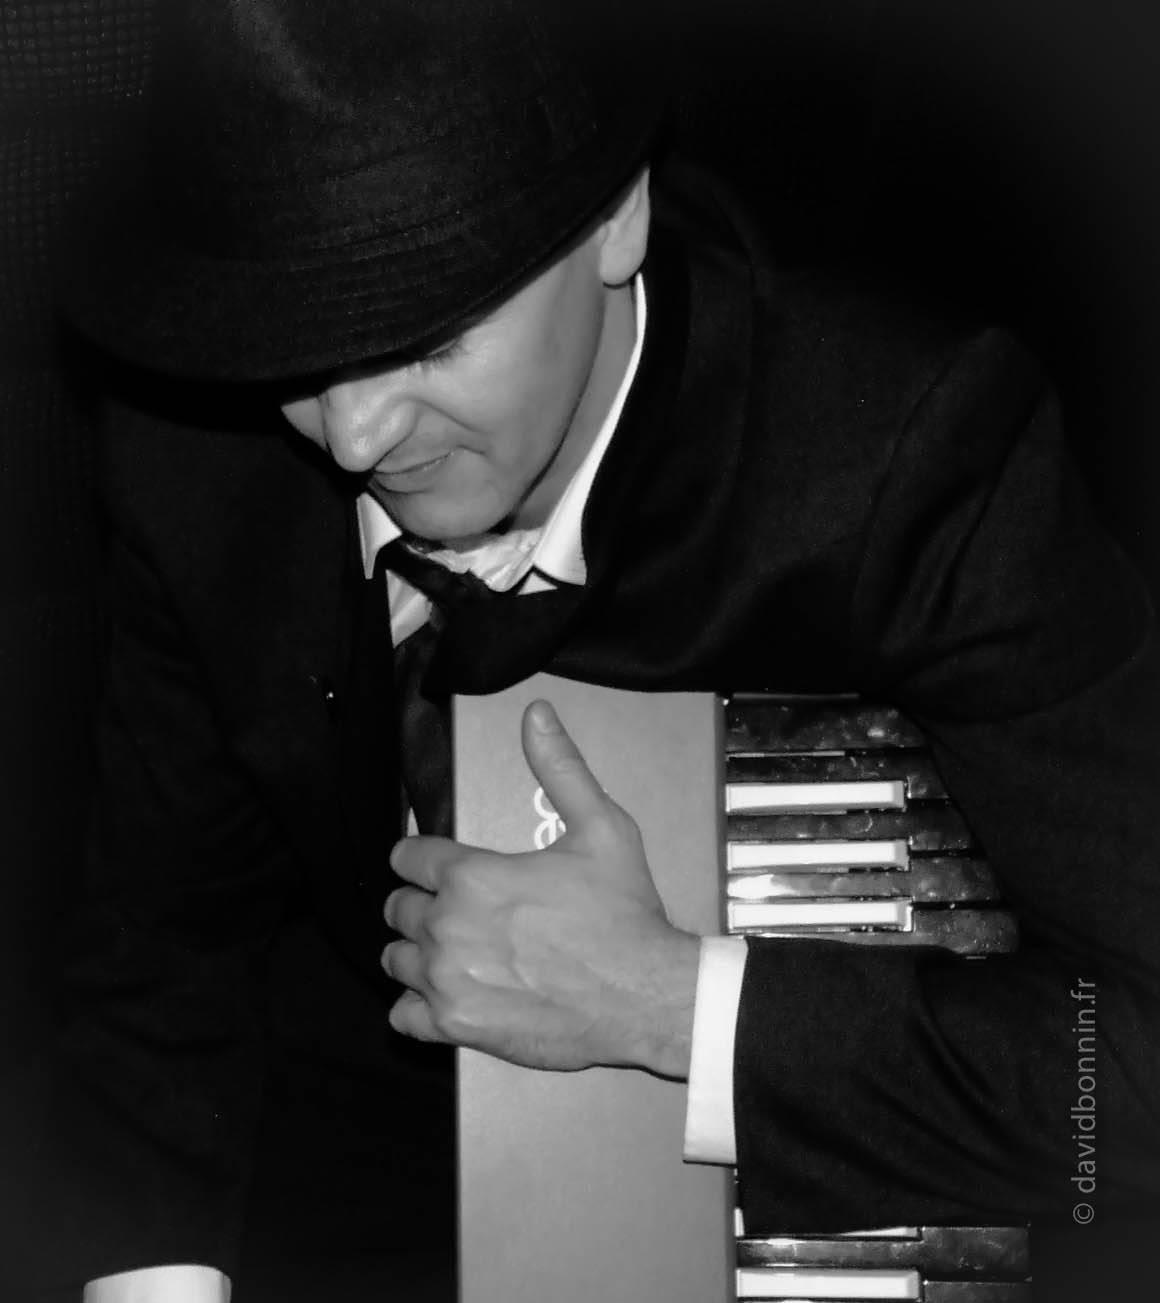 david bonnin - Pianiste